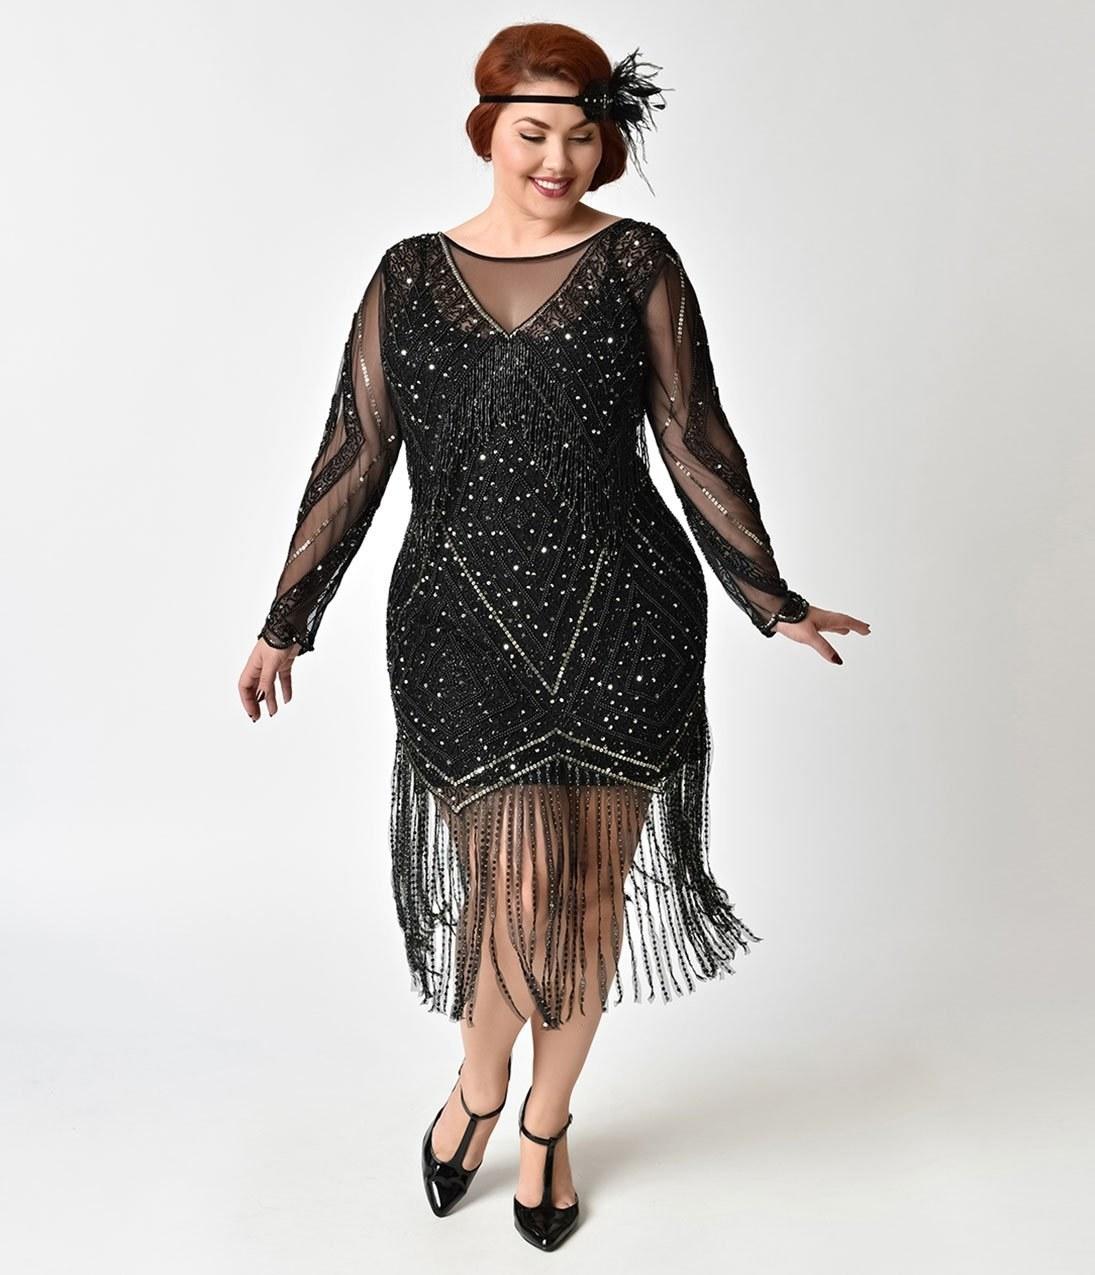 Formal Dress Costume